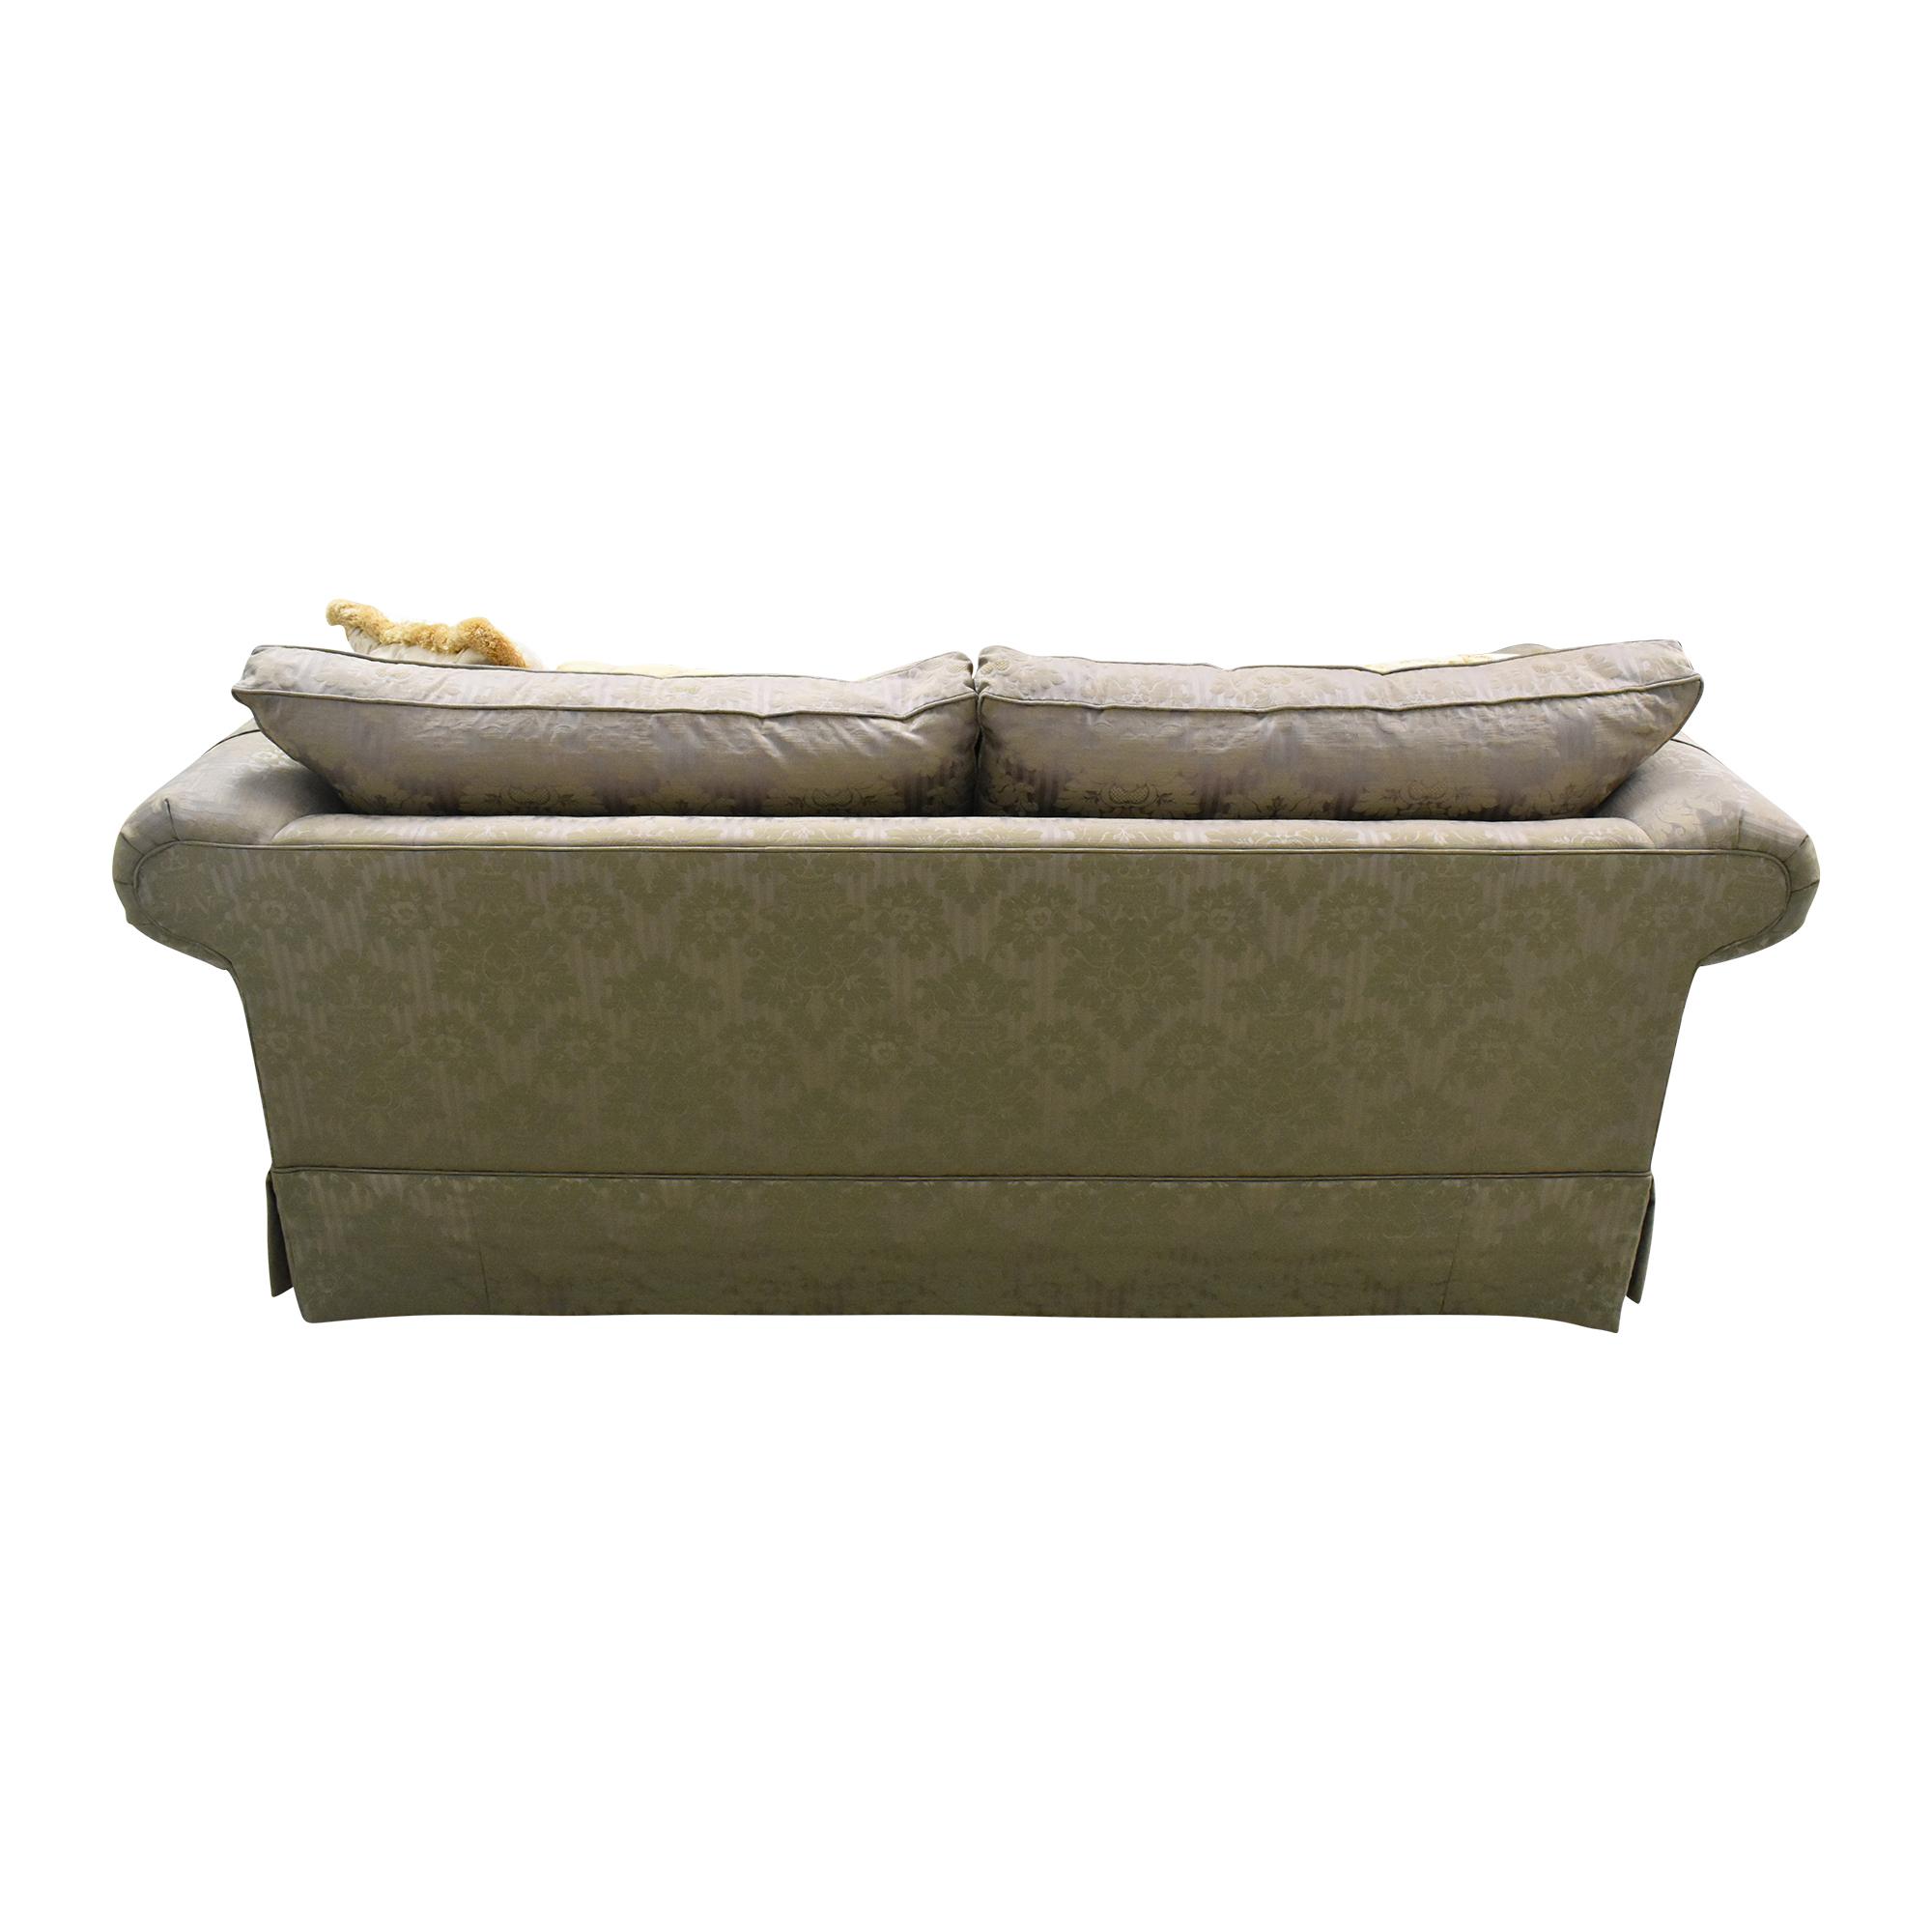 Ethan Allen Two Cushion Roll Arm Sofa / Classic Sofas